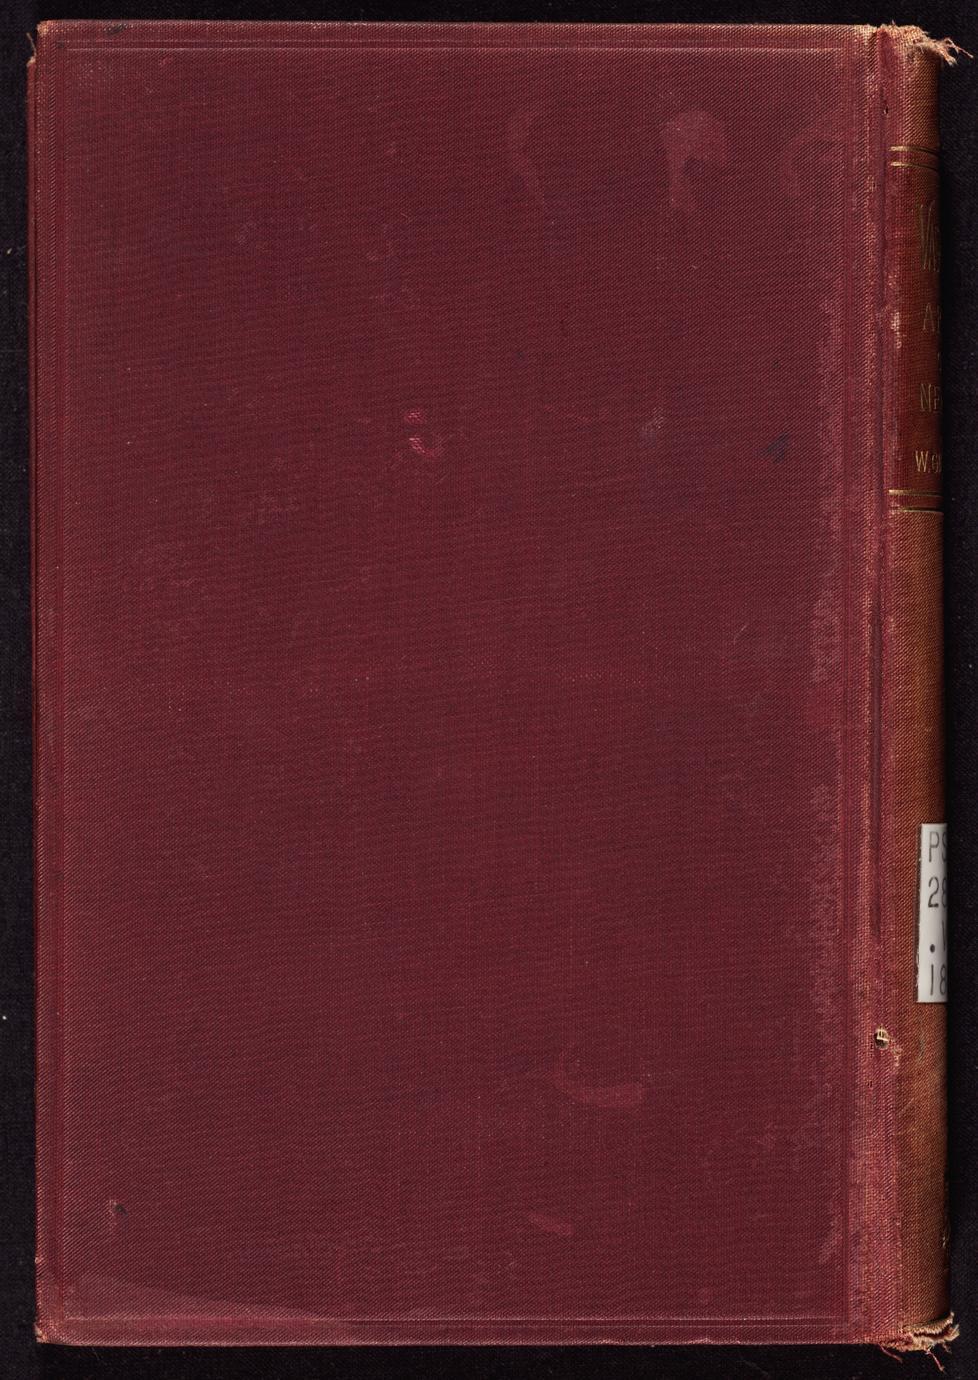 Vasconselos : a romance of the New World (1 of 2)